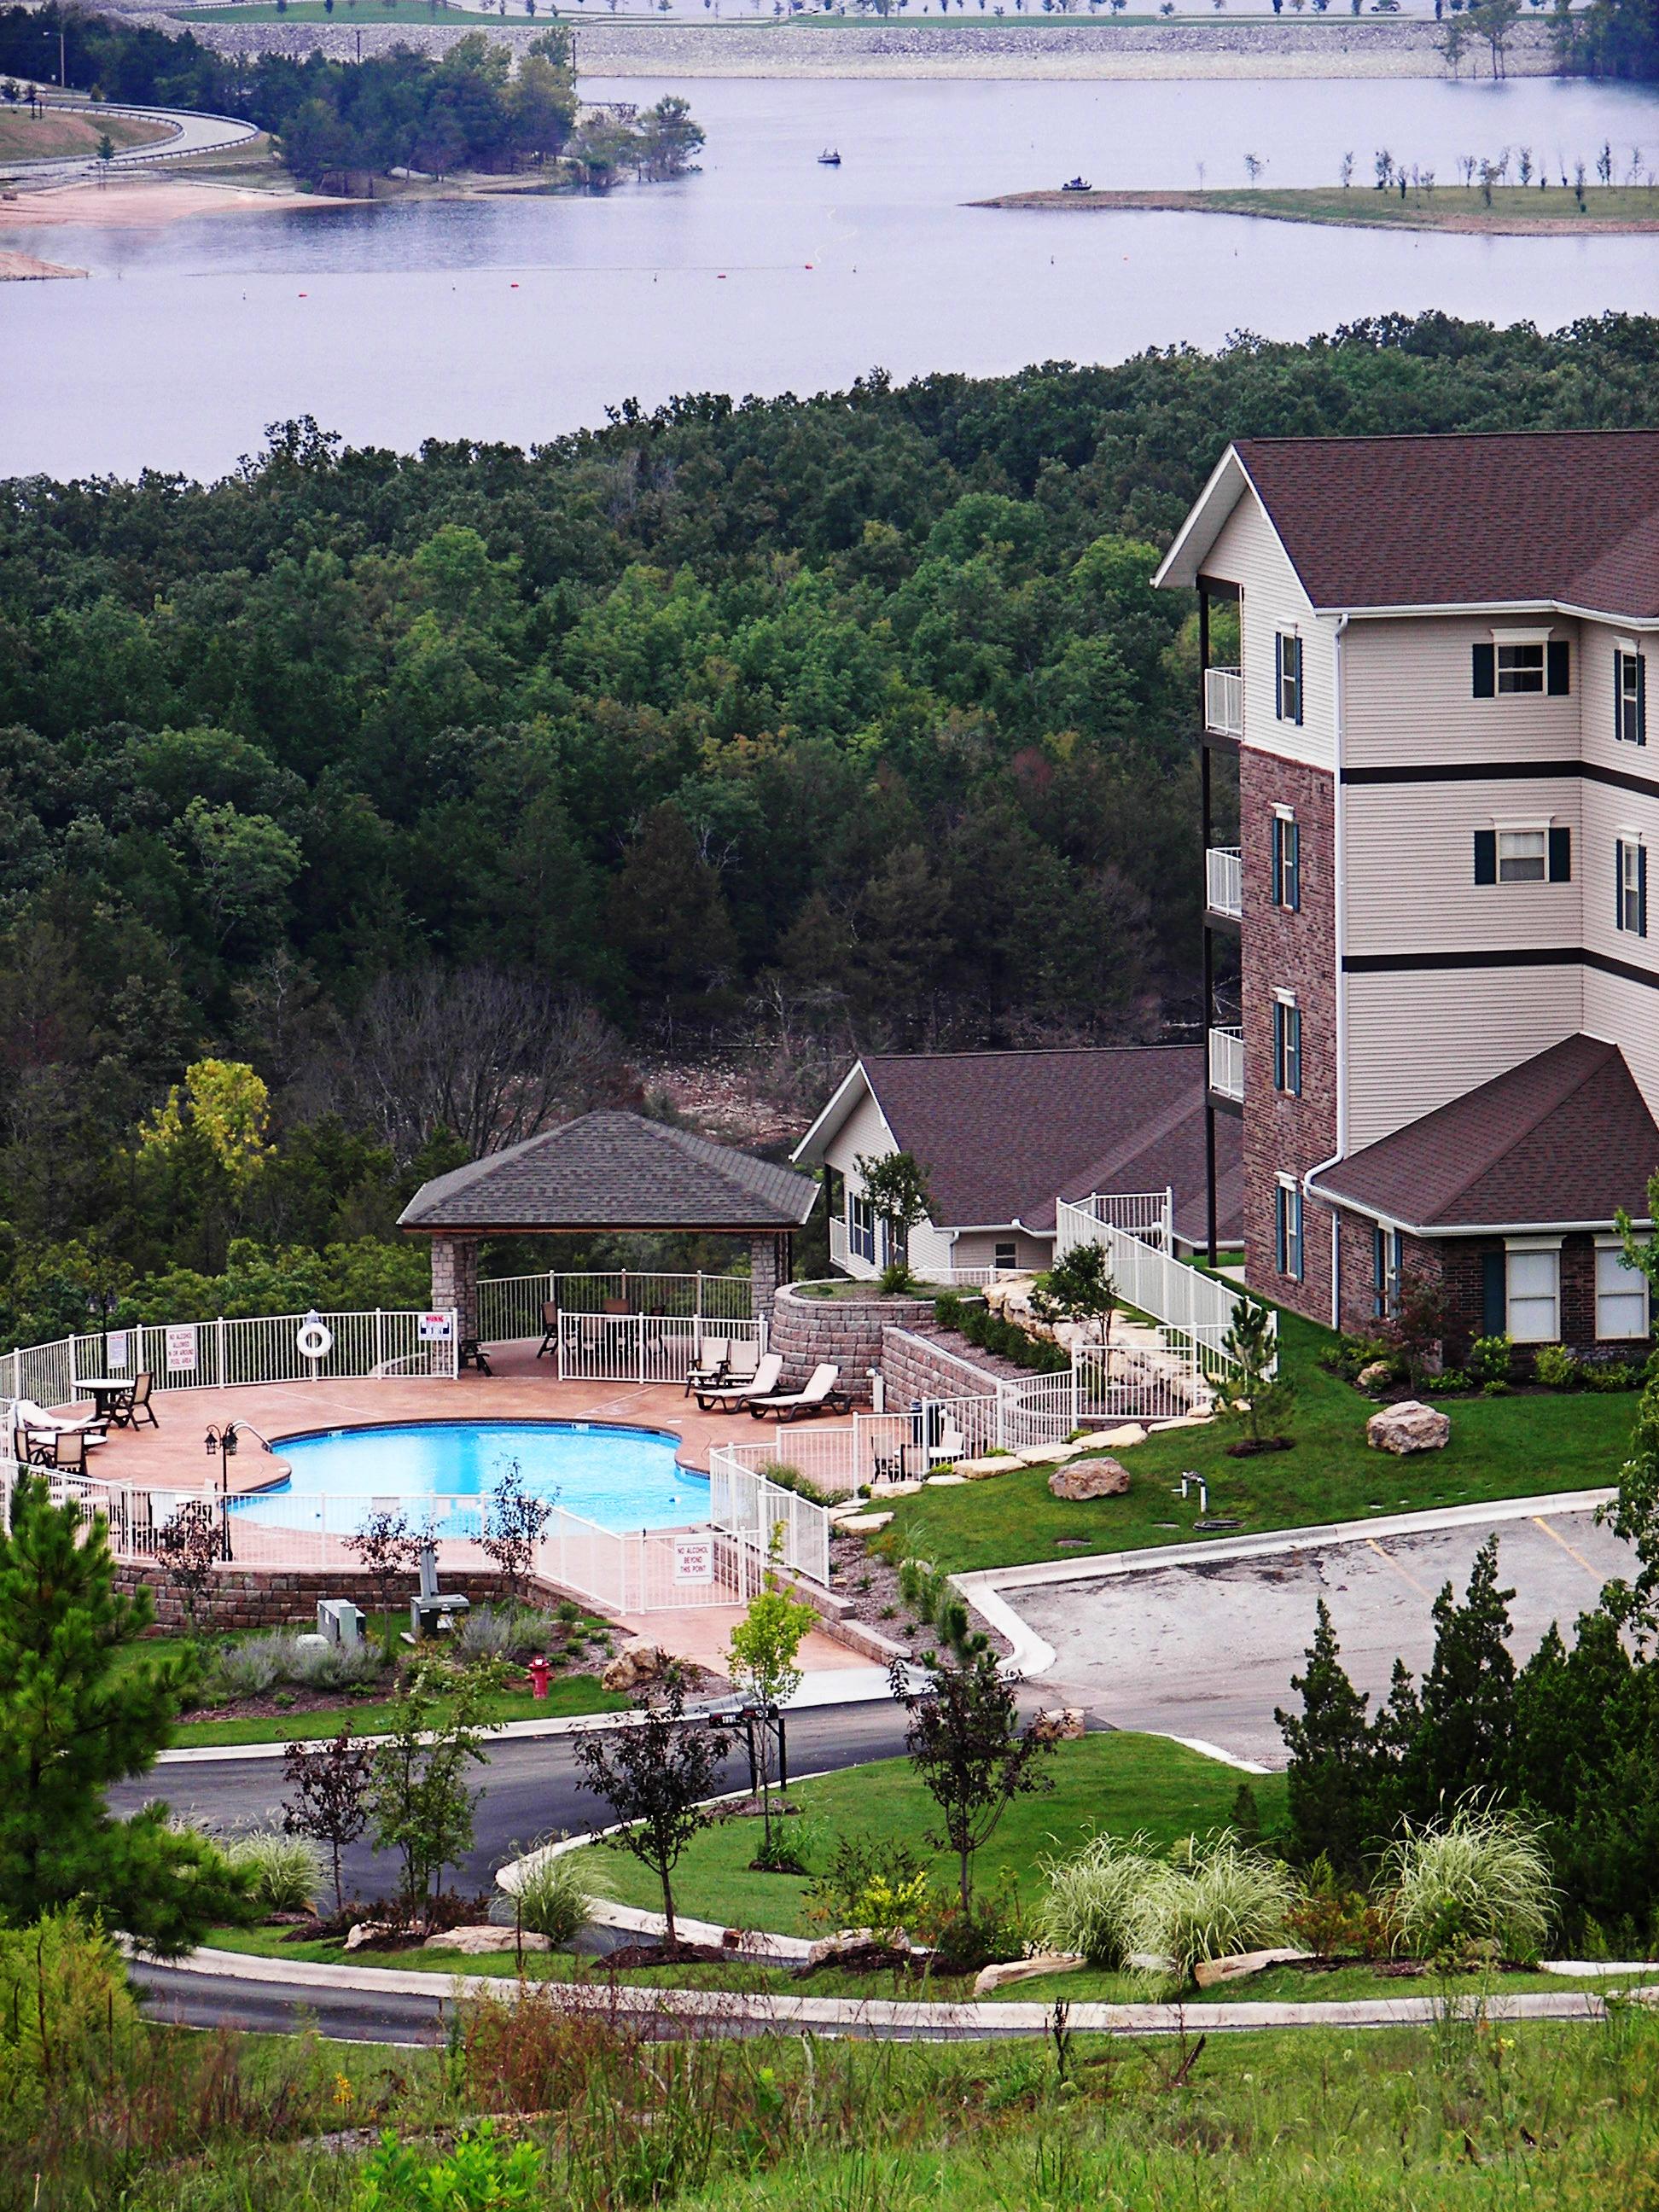 Condo amenities branson lake condos for Branson cabins and condos